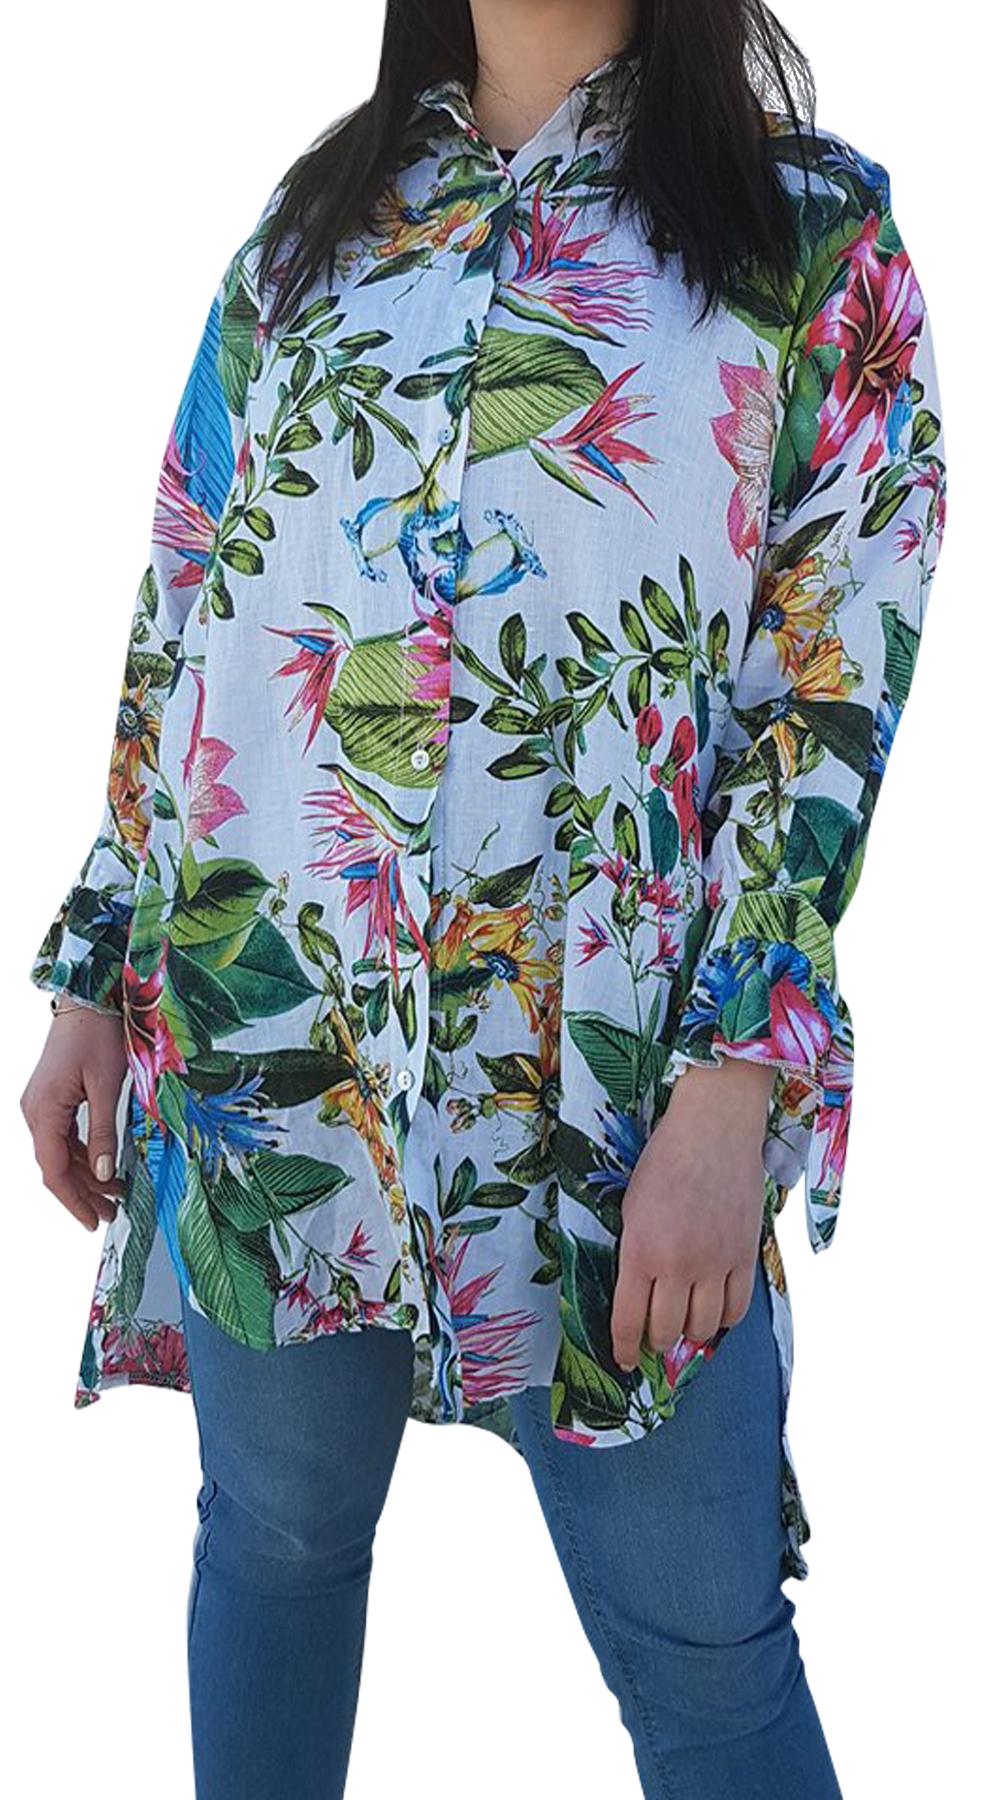 Oversized φλοράλ πουκαμίσα - MissReina - SP18GAL-18156 curvy plus μπλούζες   πουκάμισα